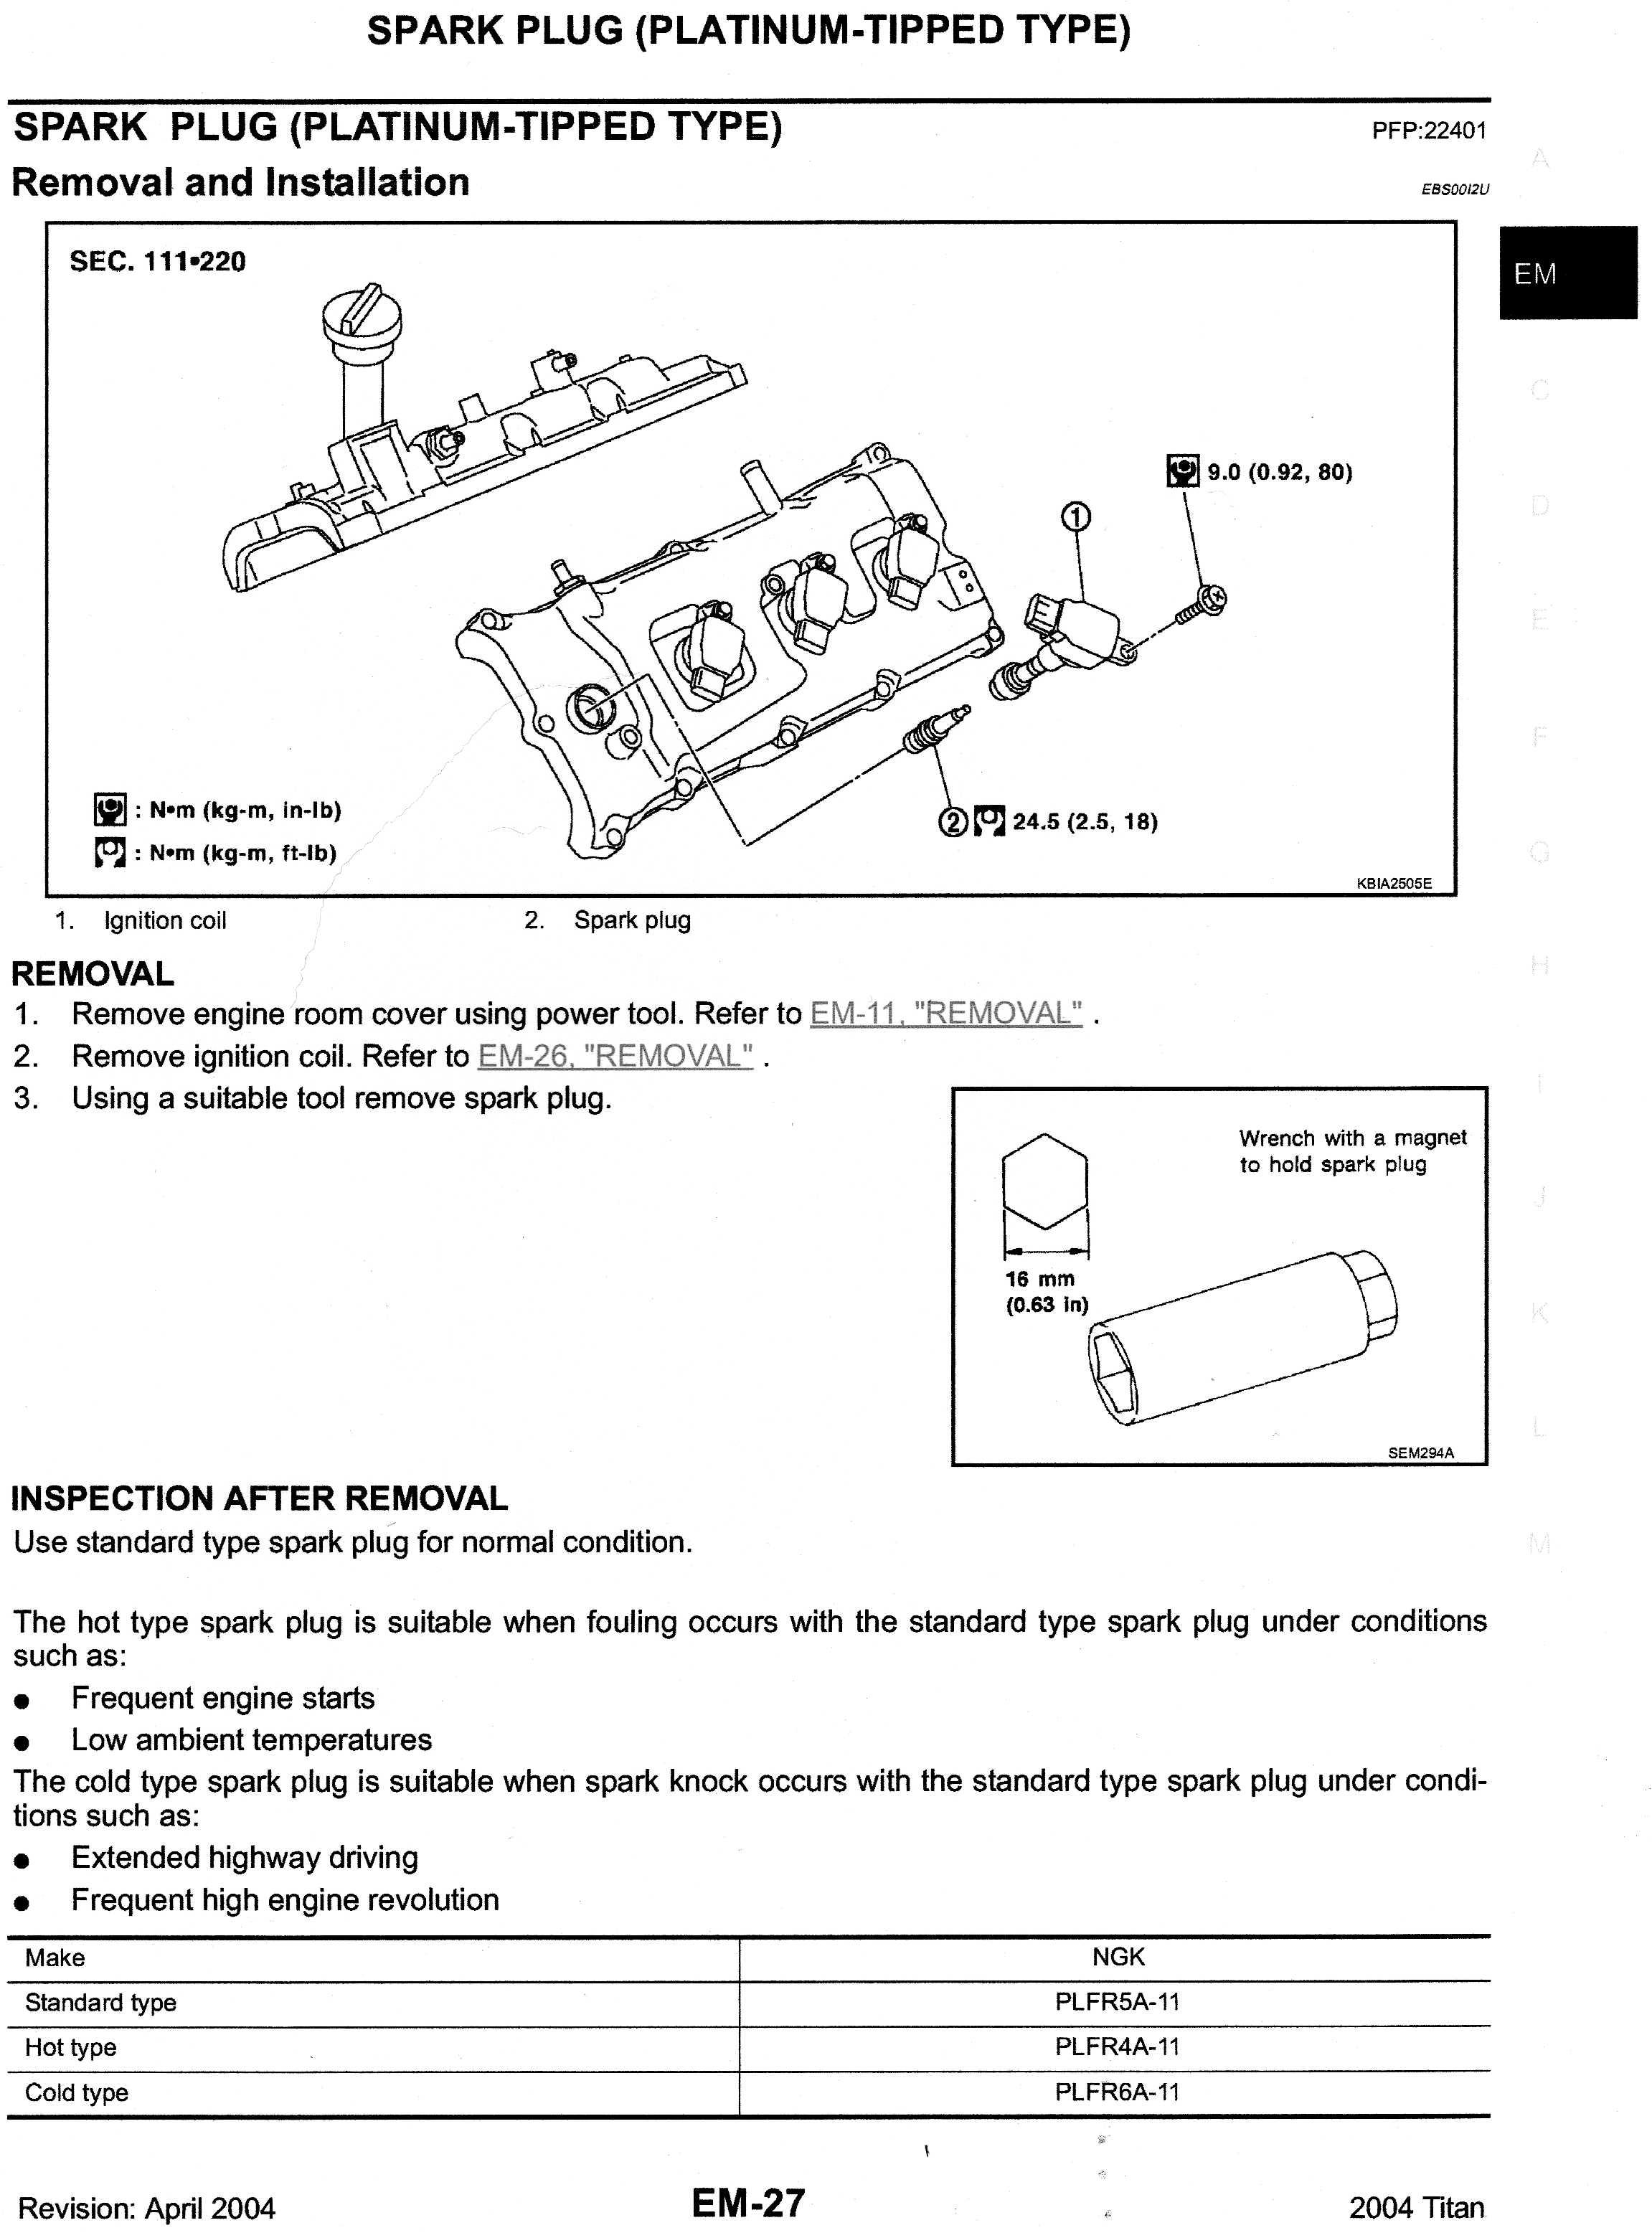 Sparkplugs Type Torque Gap How To Nissan Titan Forum Ford Spark Plug Settings Amp Img021